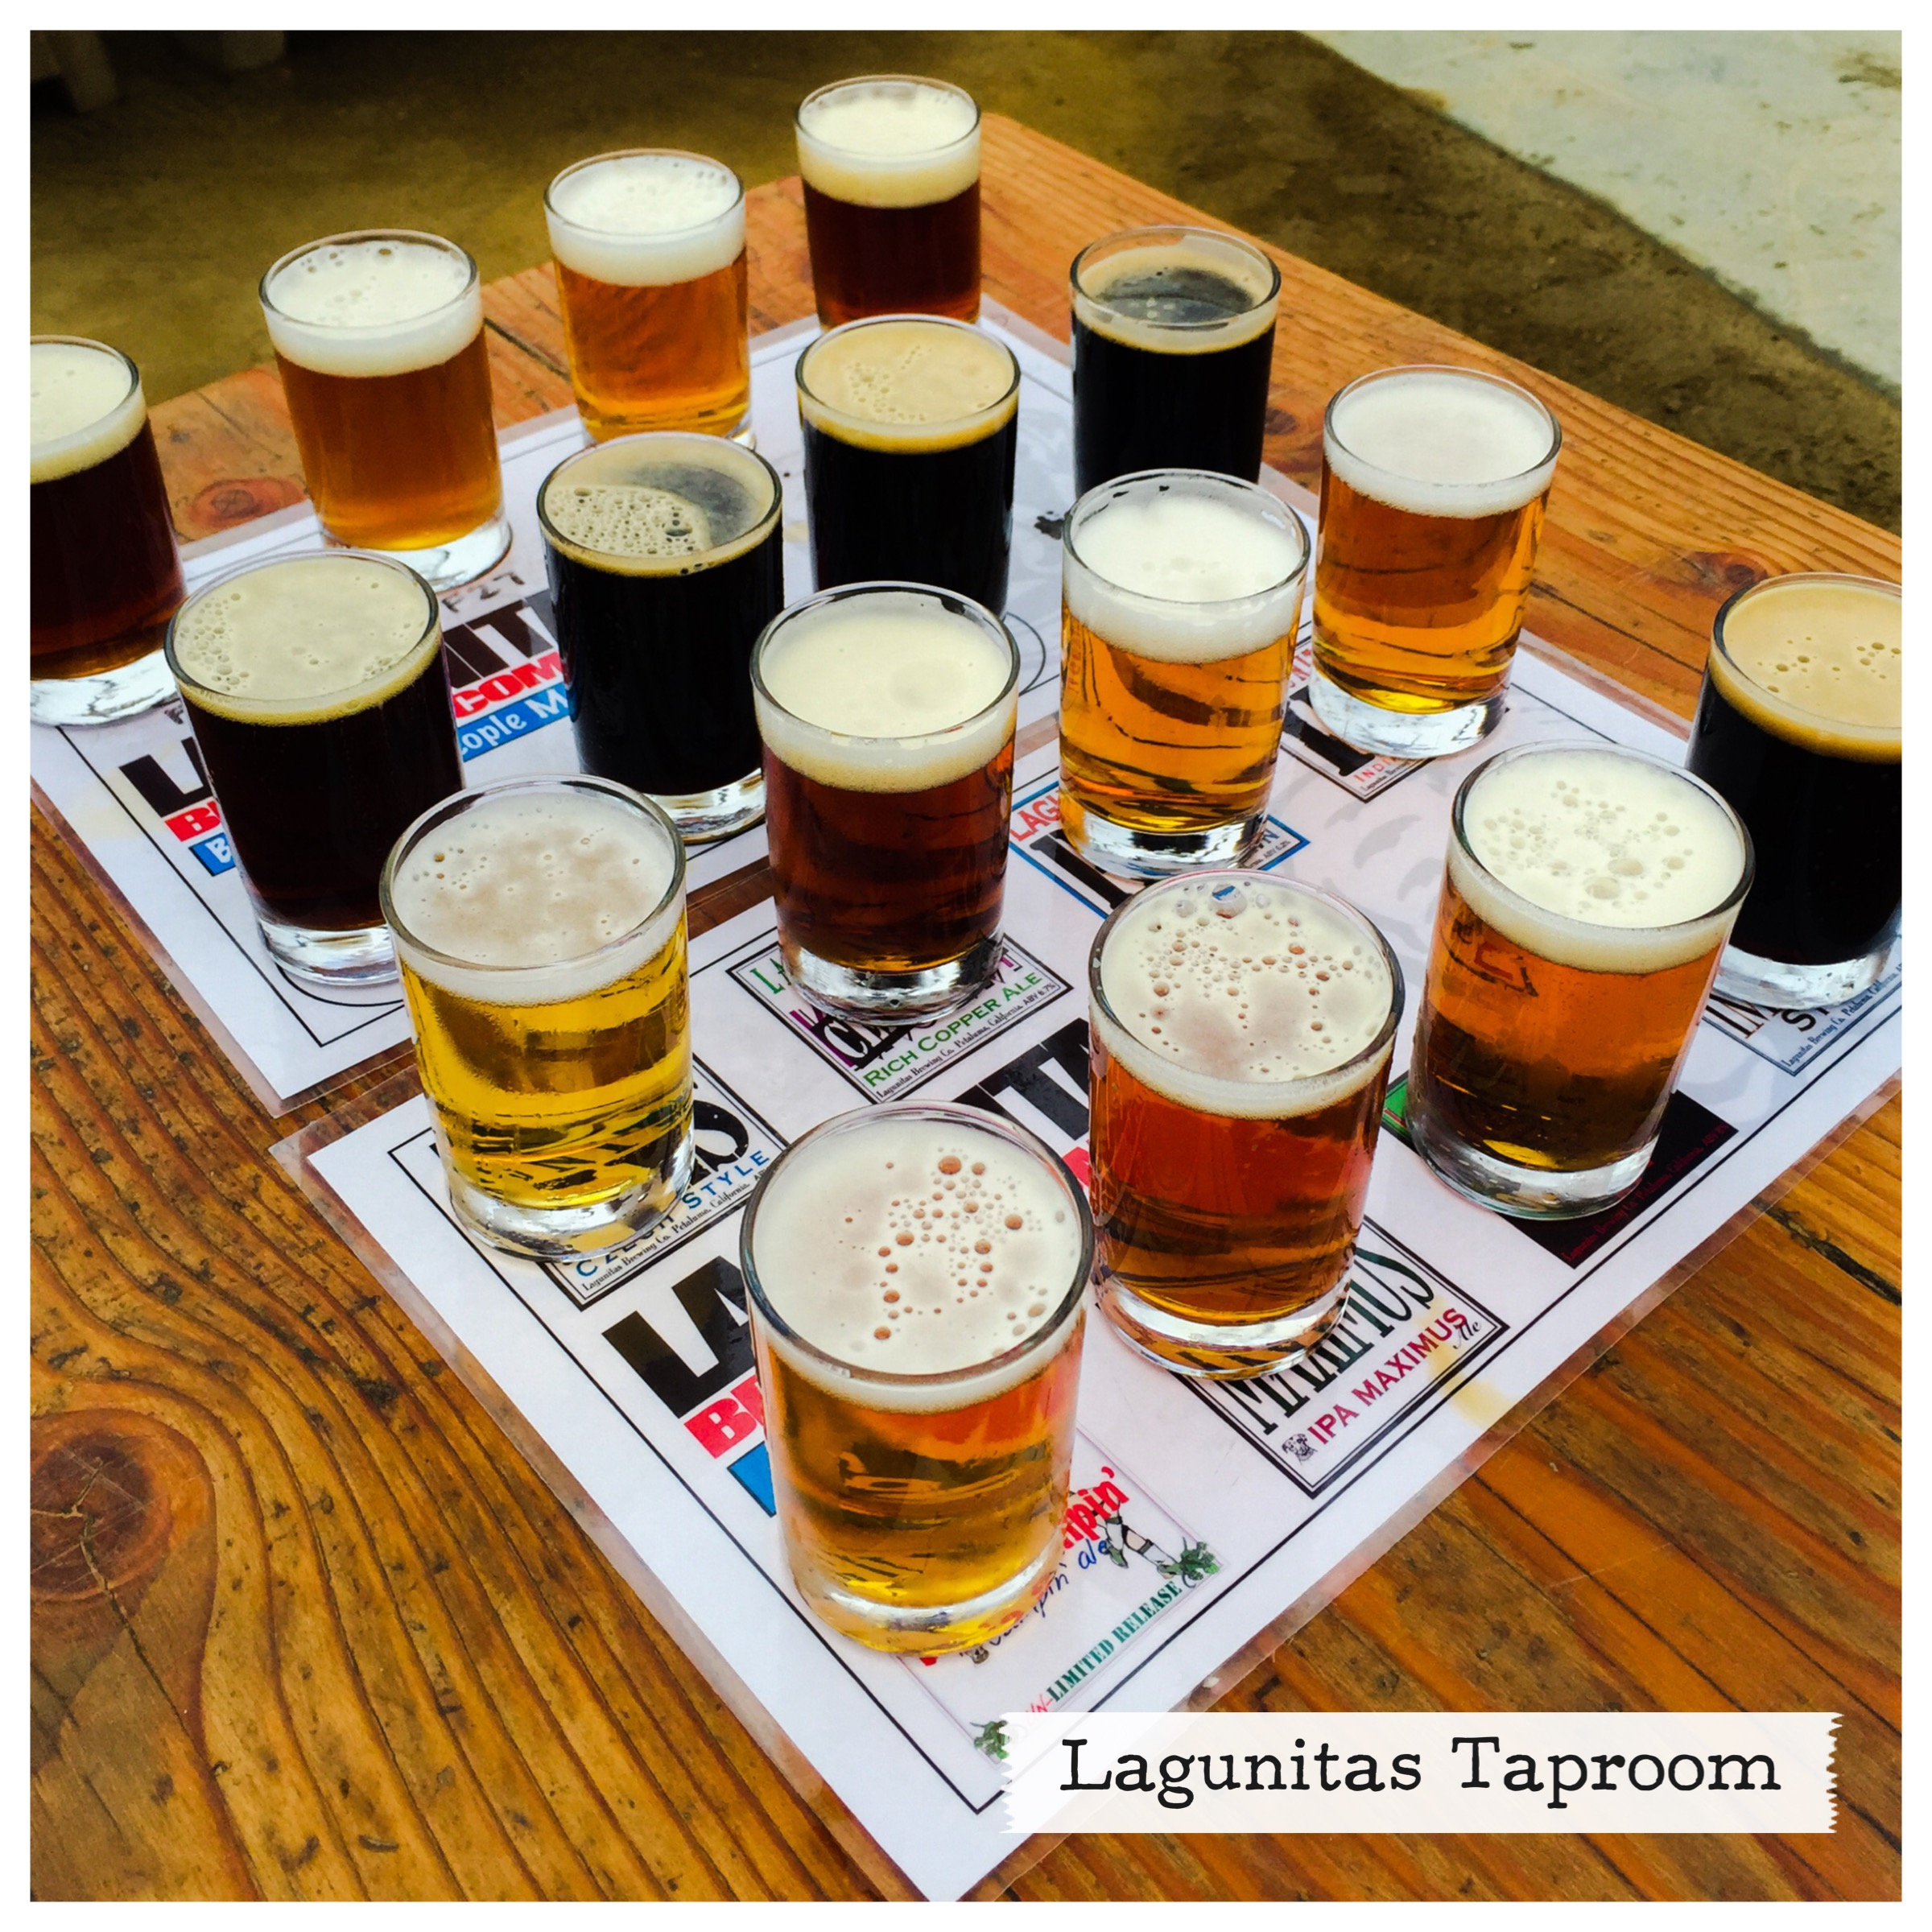 Beer flight at Lagunitas Taproom in Petaluma